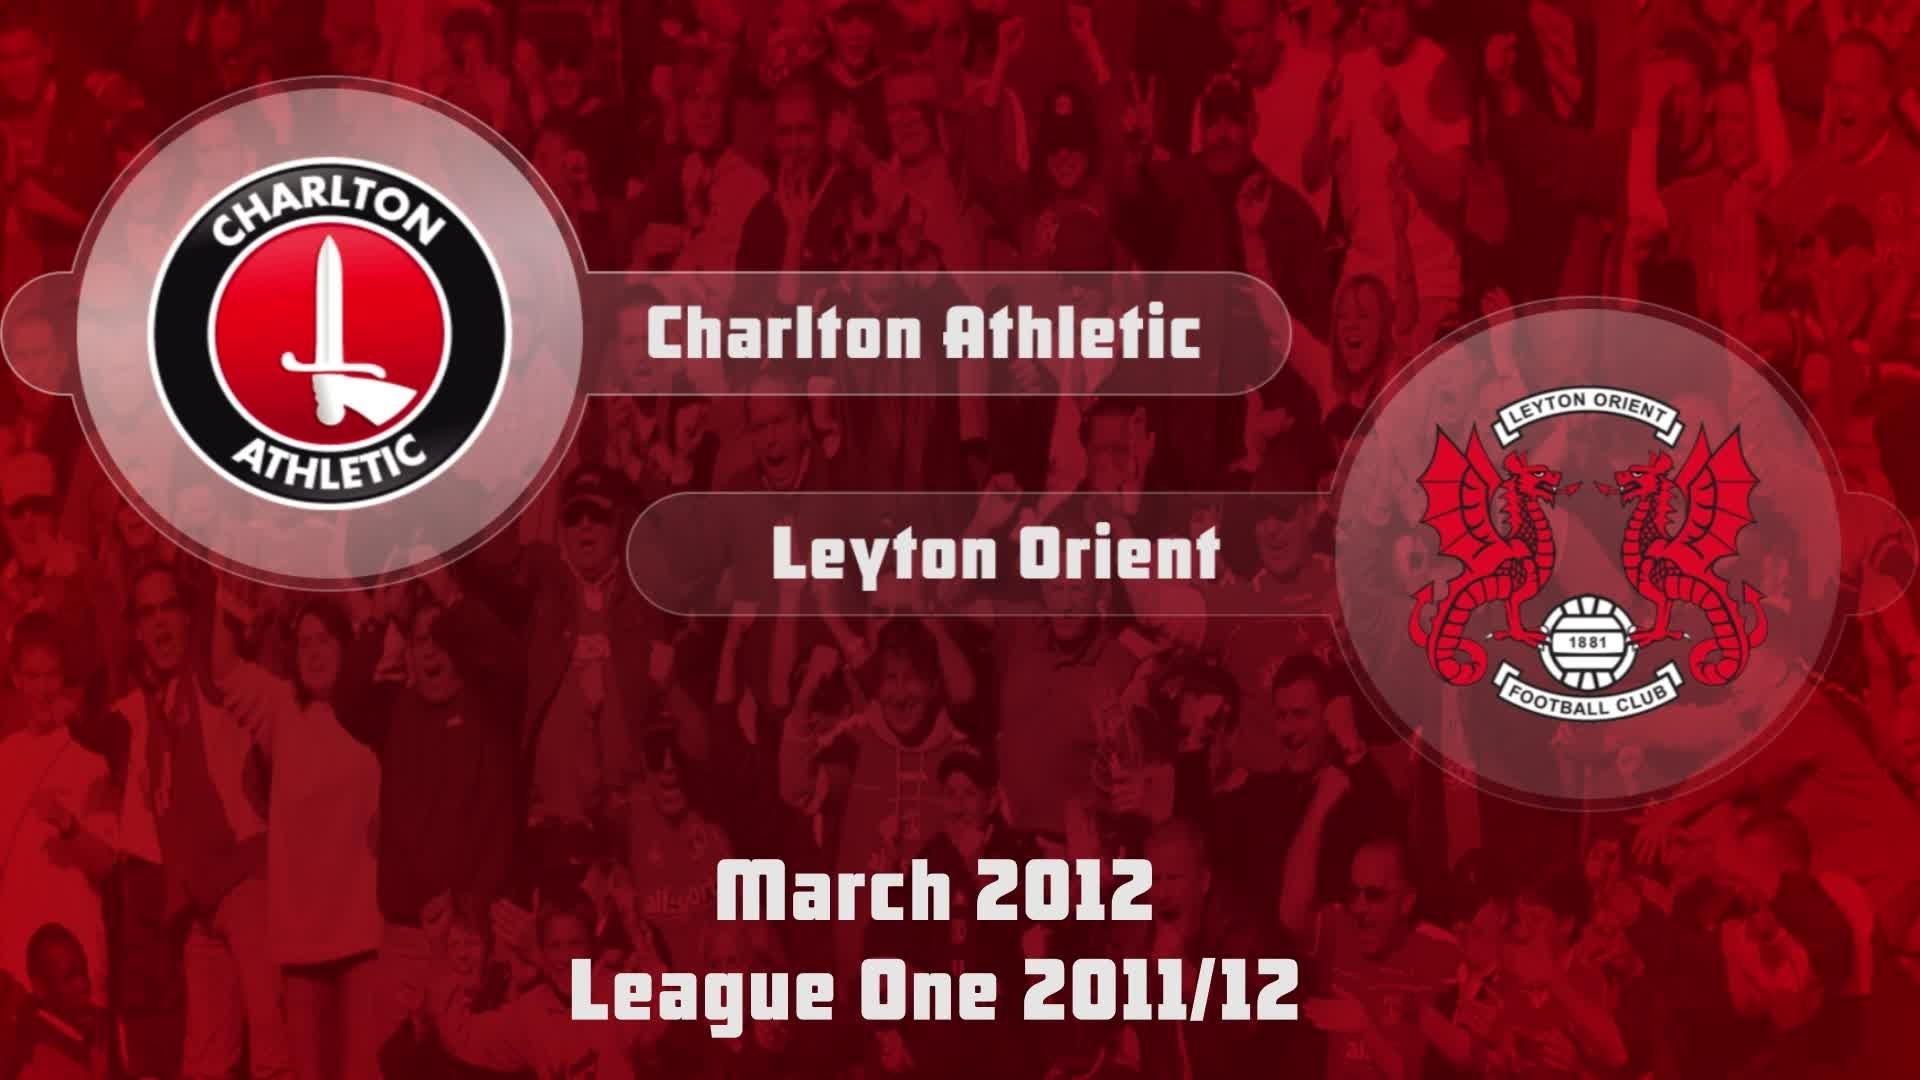 46 HIGHLIGHTS | Charlton 2 Leyton Orient 0 (March 2012)